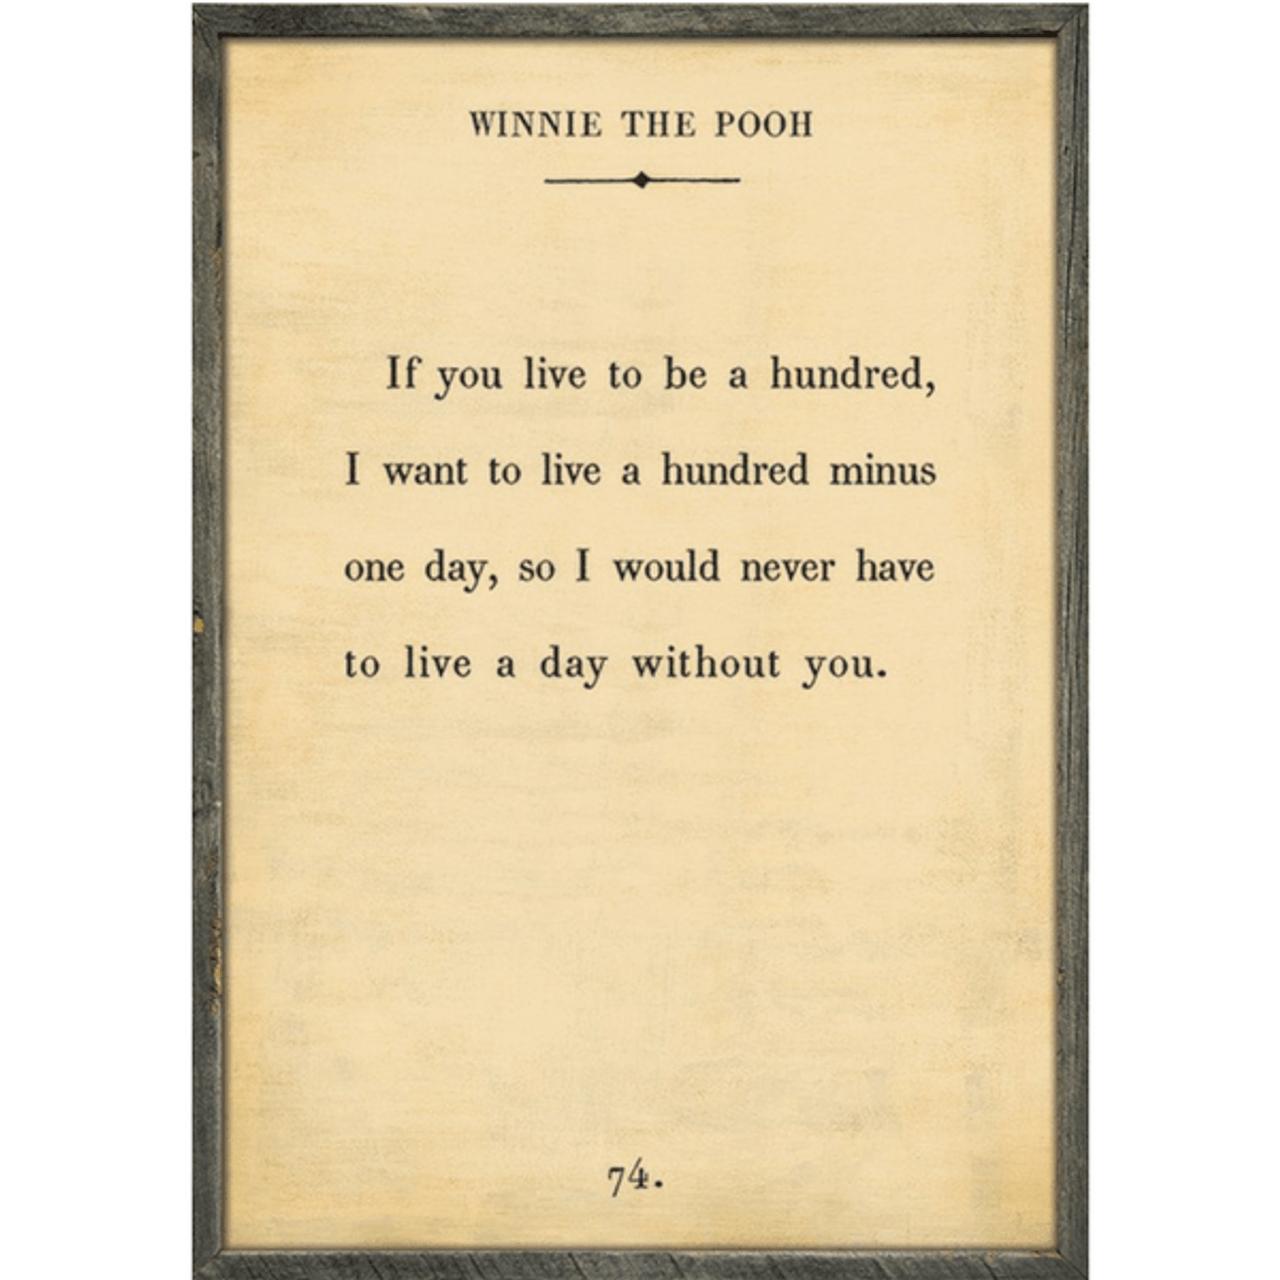 winnie the pooh art print - cream with grey wood frame